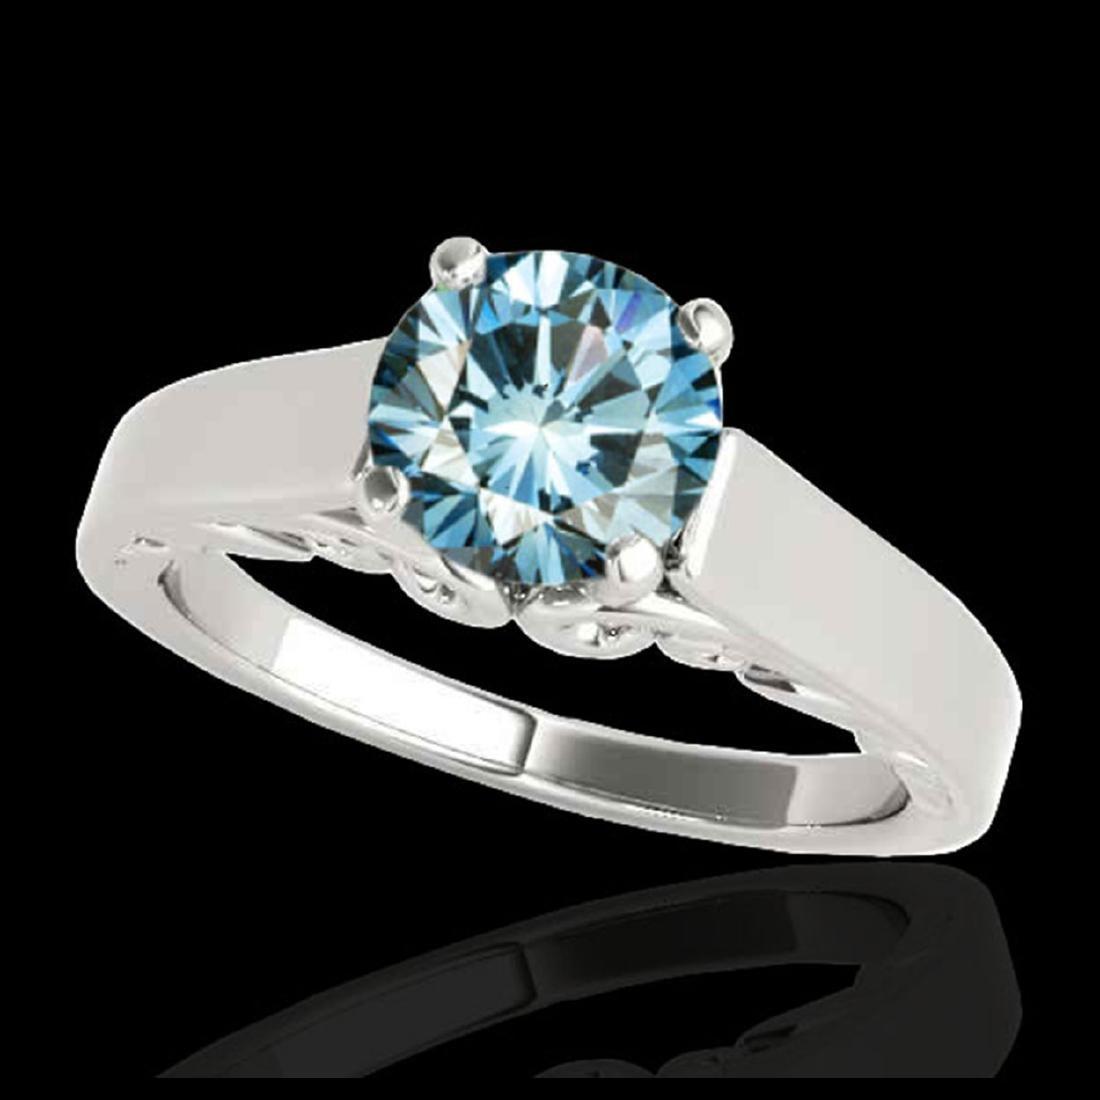 1 ctw SI Fancy Blue Diamond Solitaire Ring 10K White